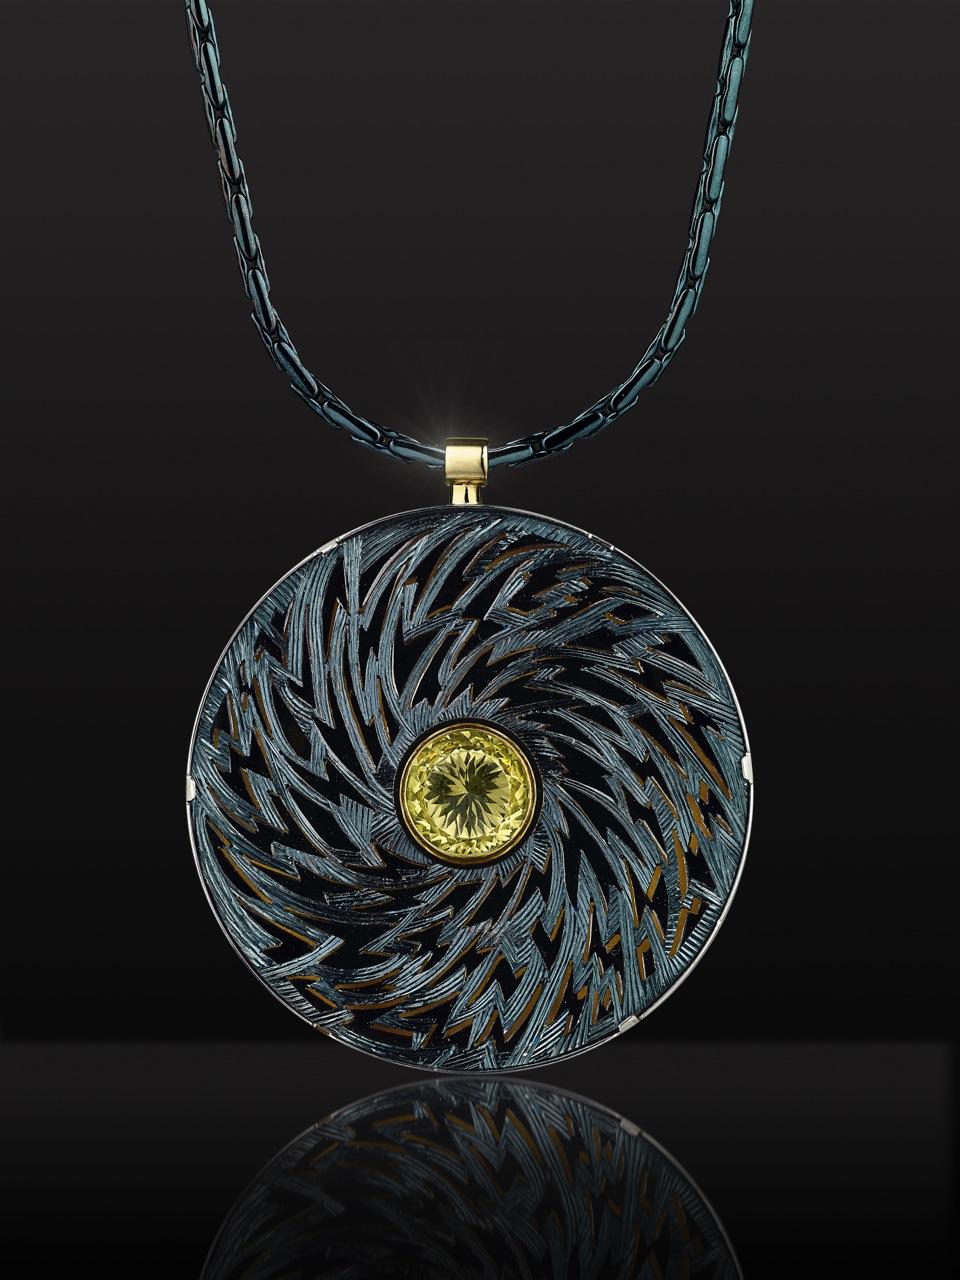 "<a href=""/node/264"">Black Lightening : Billcliffe Gallery cover photo. 6cm diameter. Silver piereced hand engraved. Finished in Bliue / Black Rhodium. Centre stone Lemon Quartz.  View 1 black background.</a>"